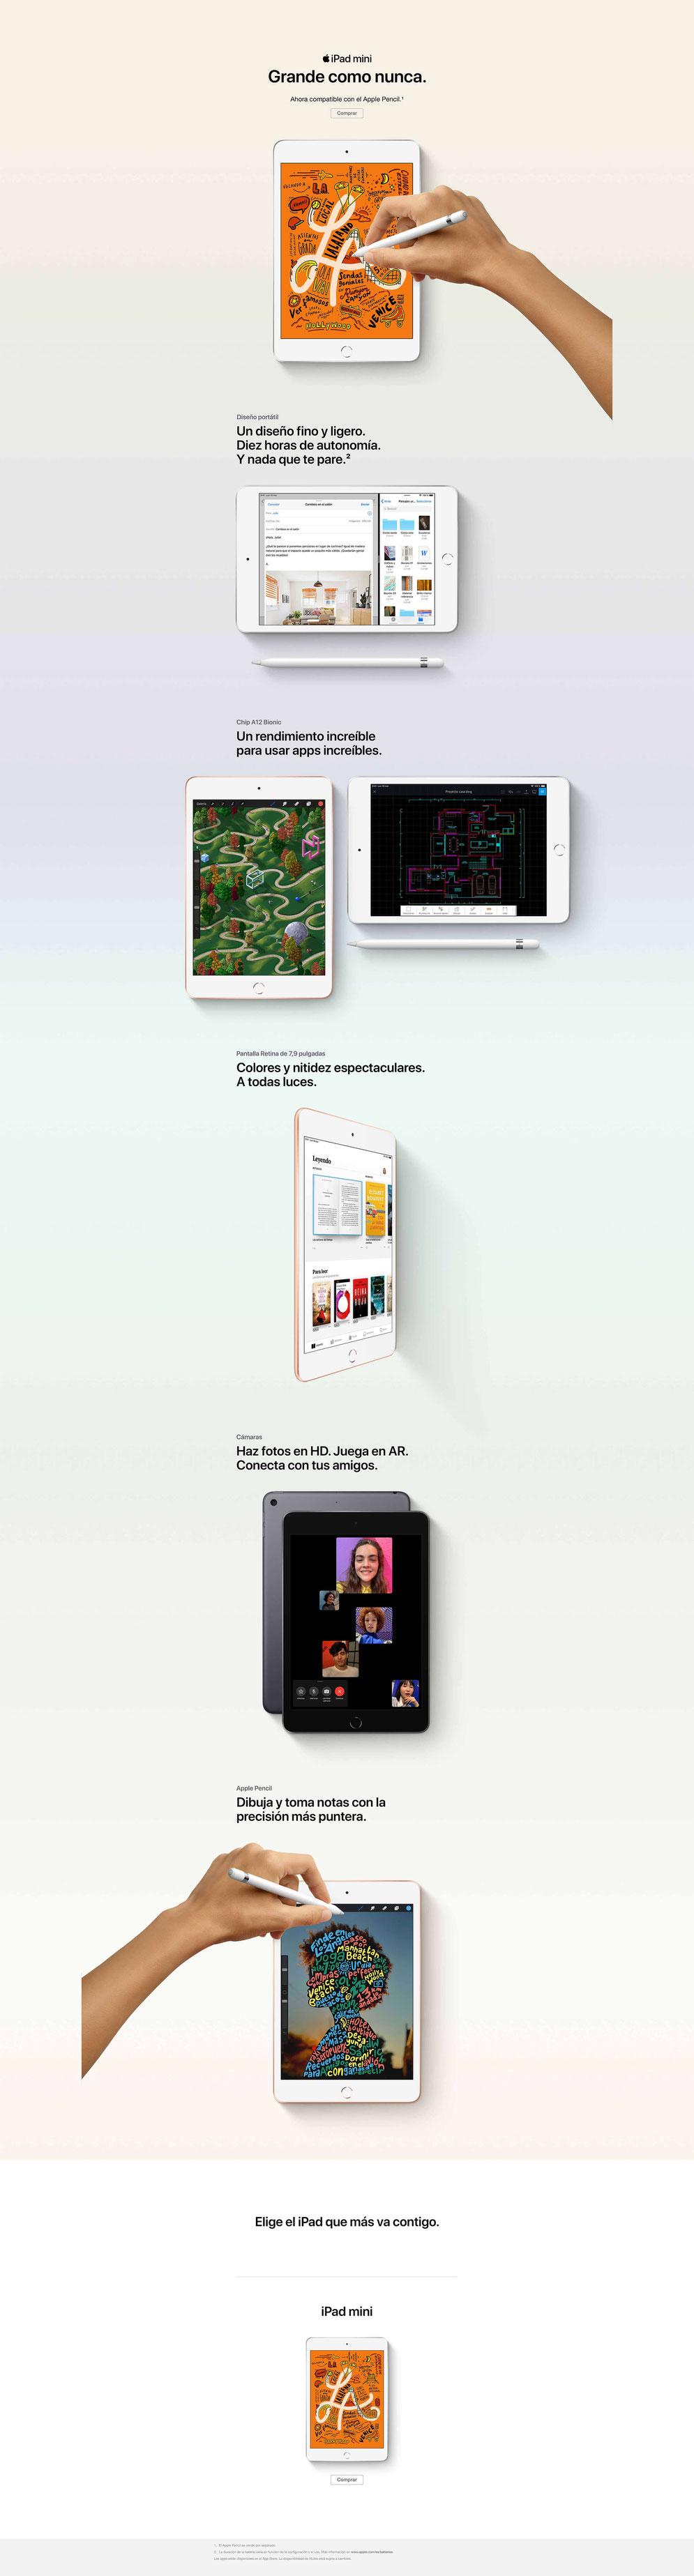 iPad Mini de 256GB 4G LTE en Tenerife